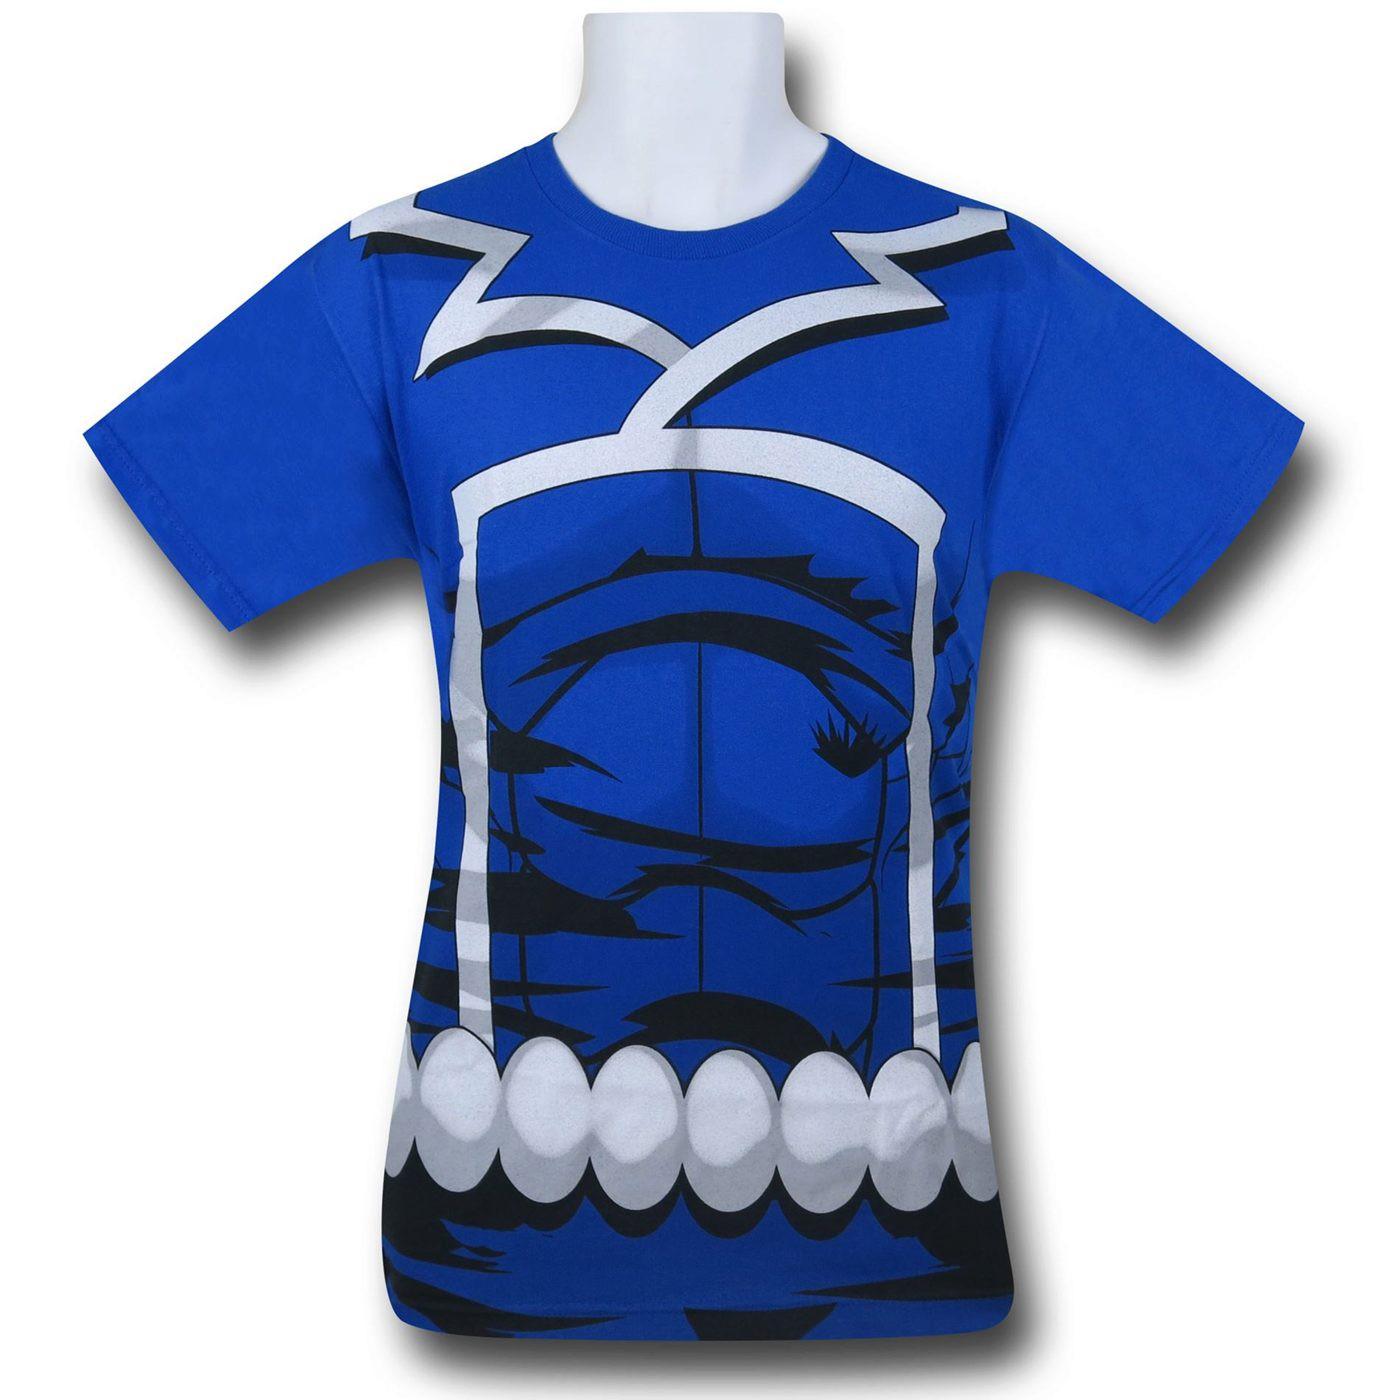 Ghost Rider Classic Johnny Blaze Costume T-Shirt